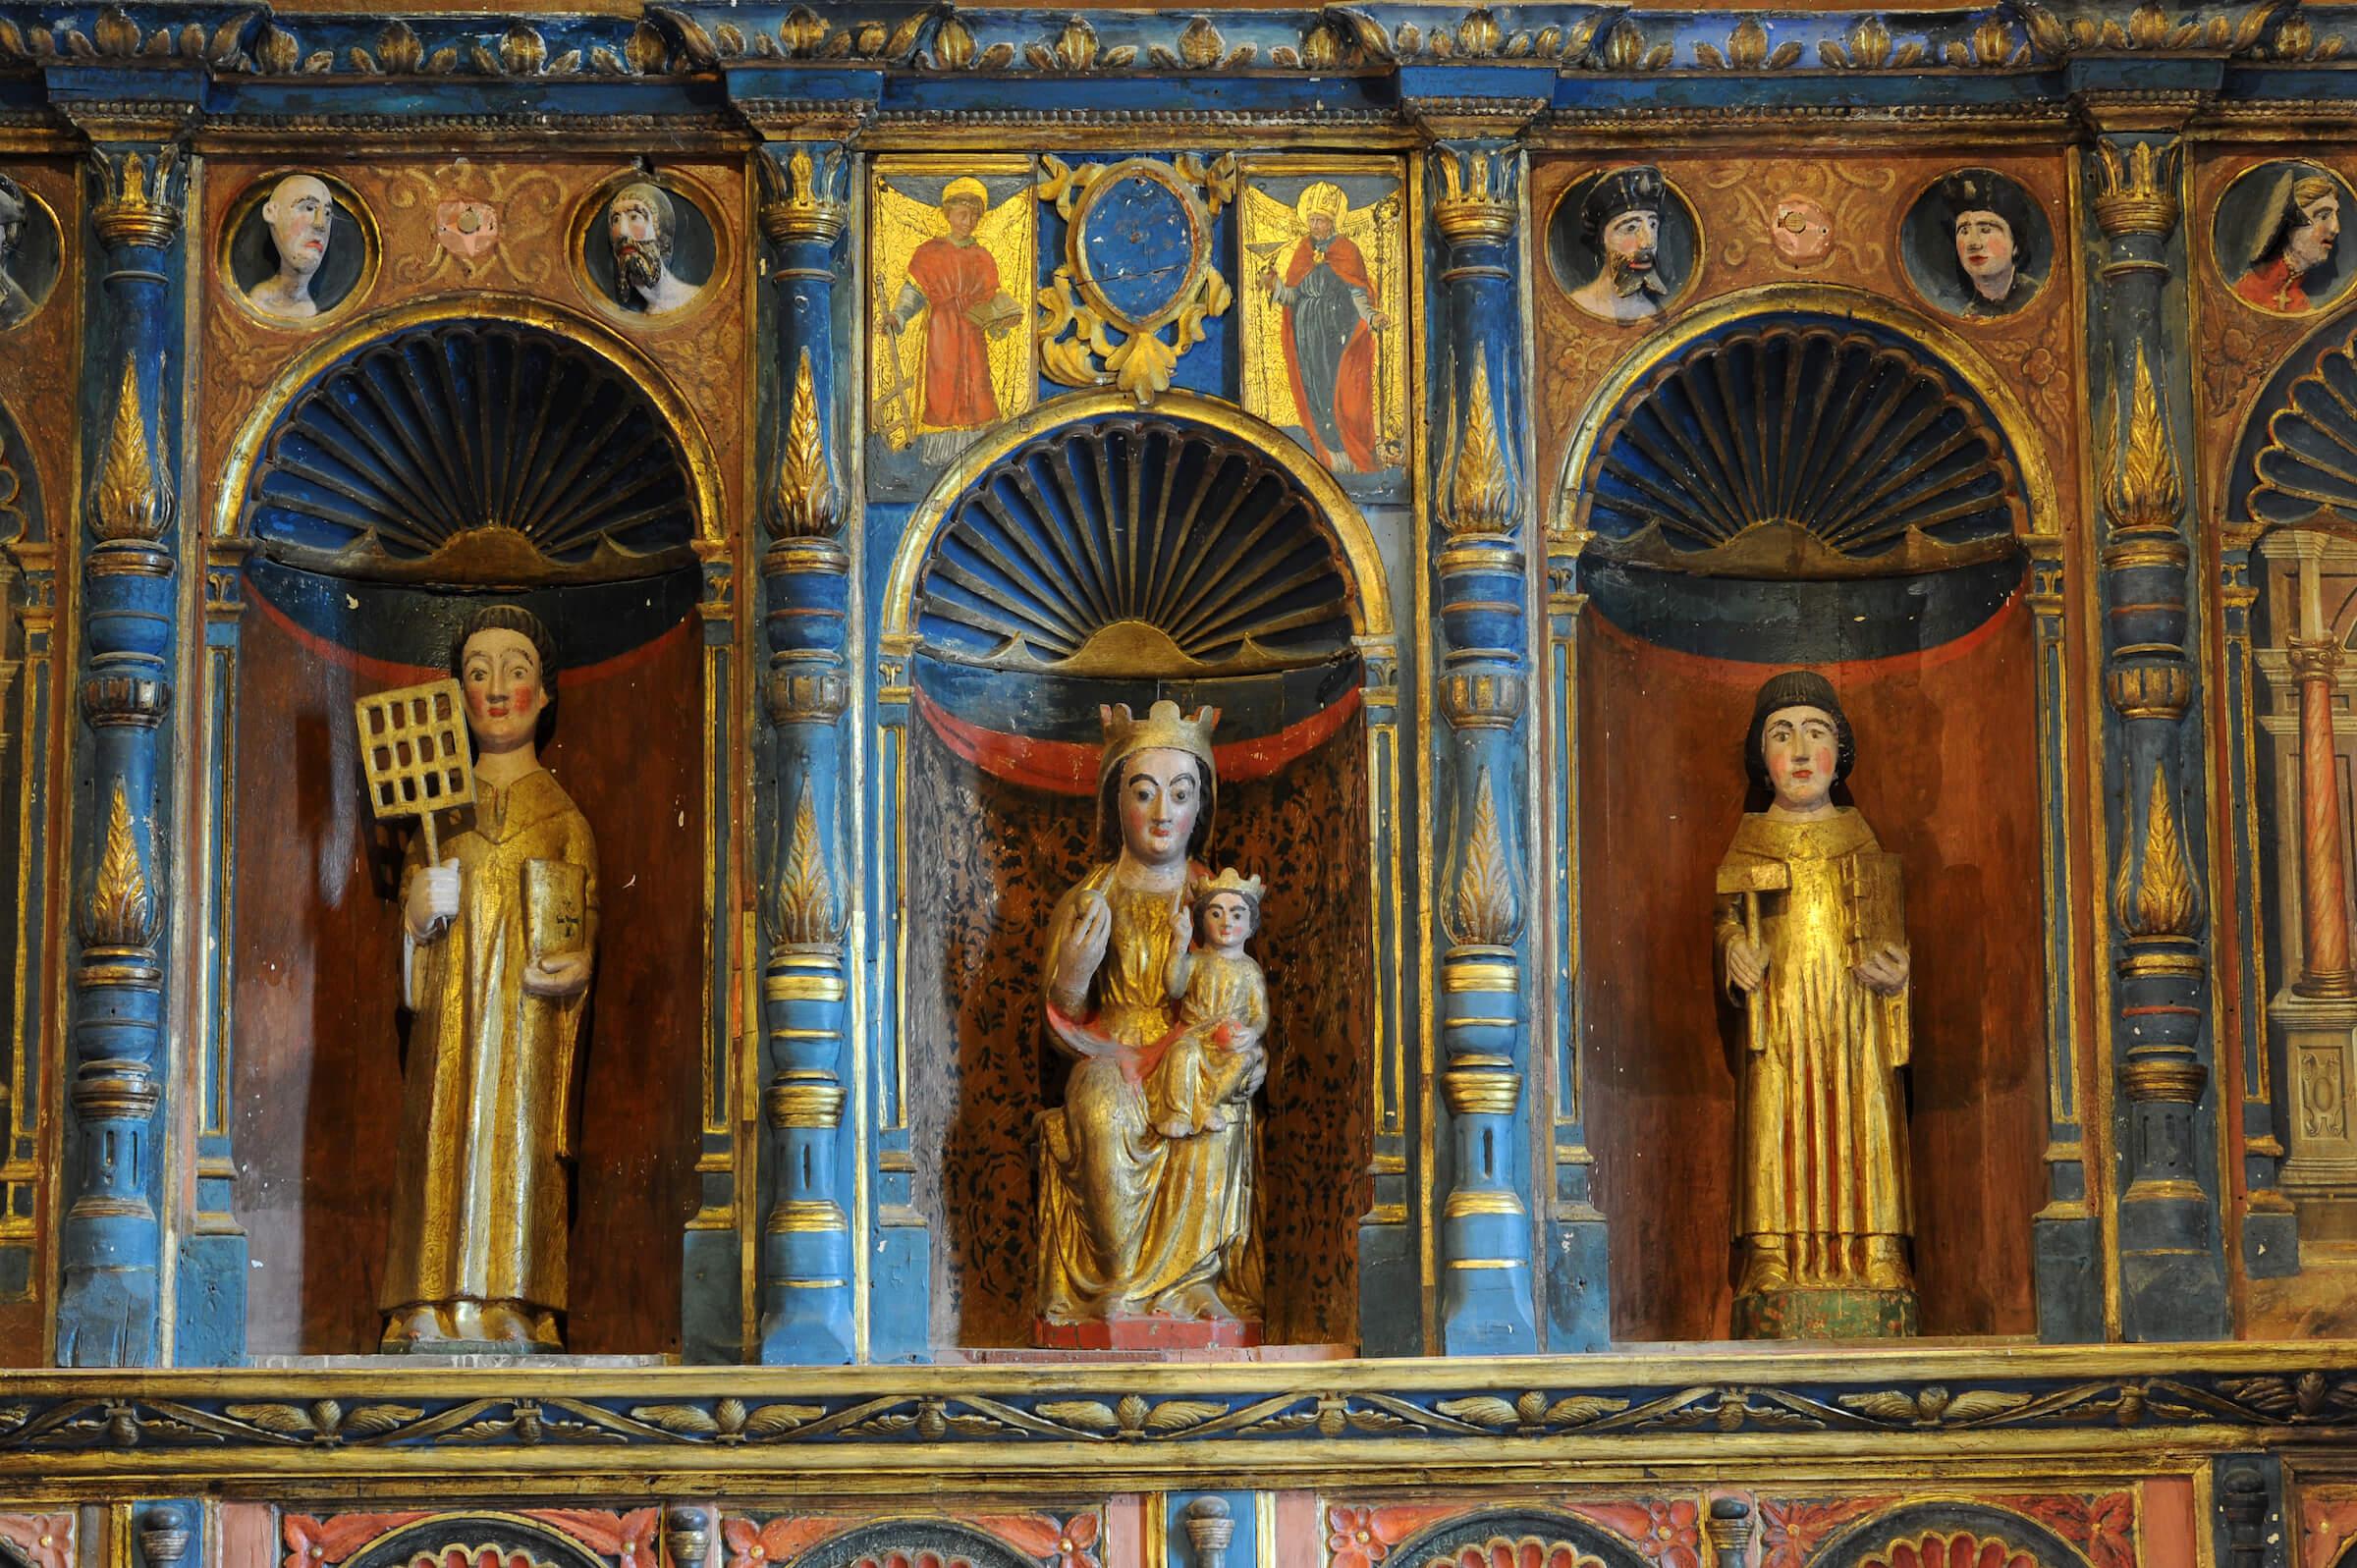 Eglise Saint-Laurent-Notre-Dame©ACIR / JJ Gelbart